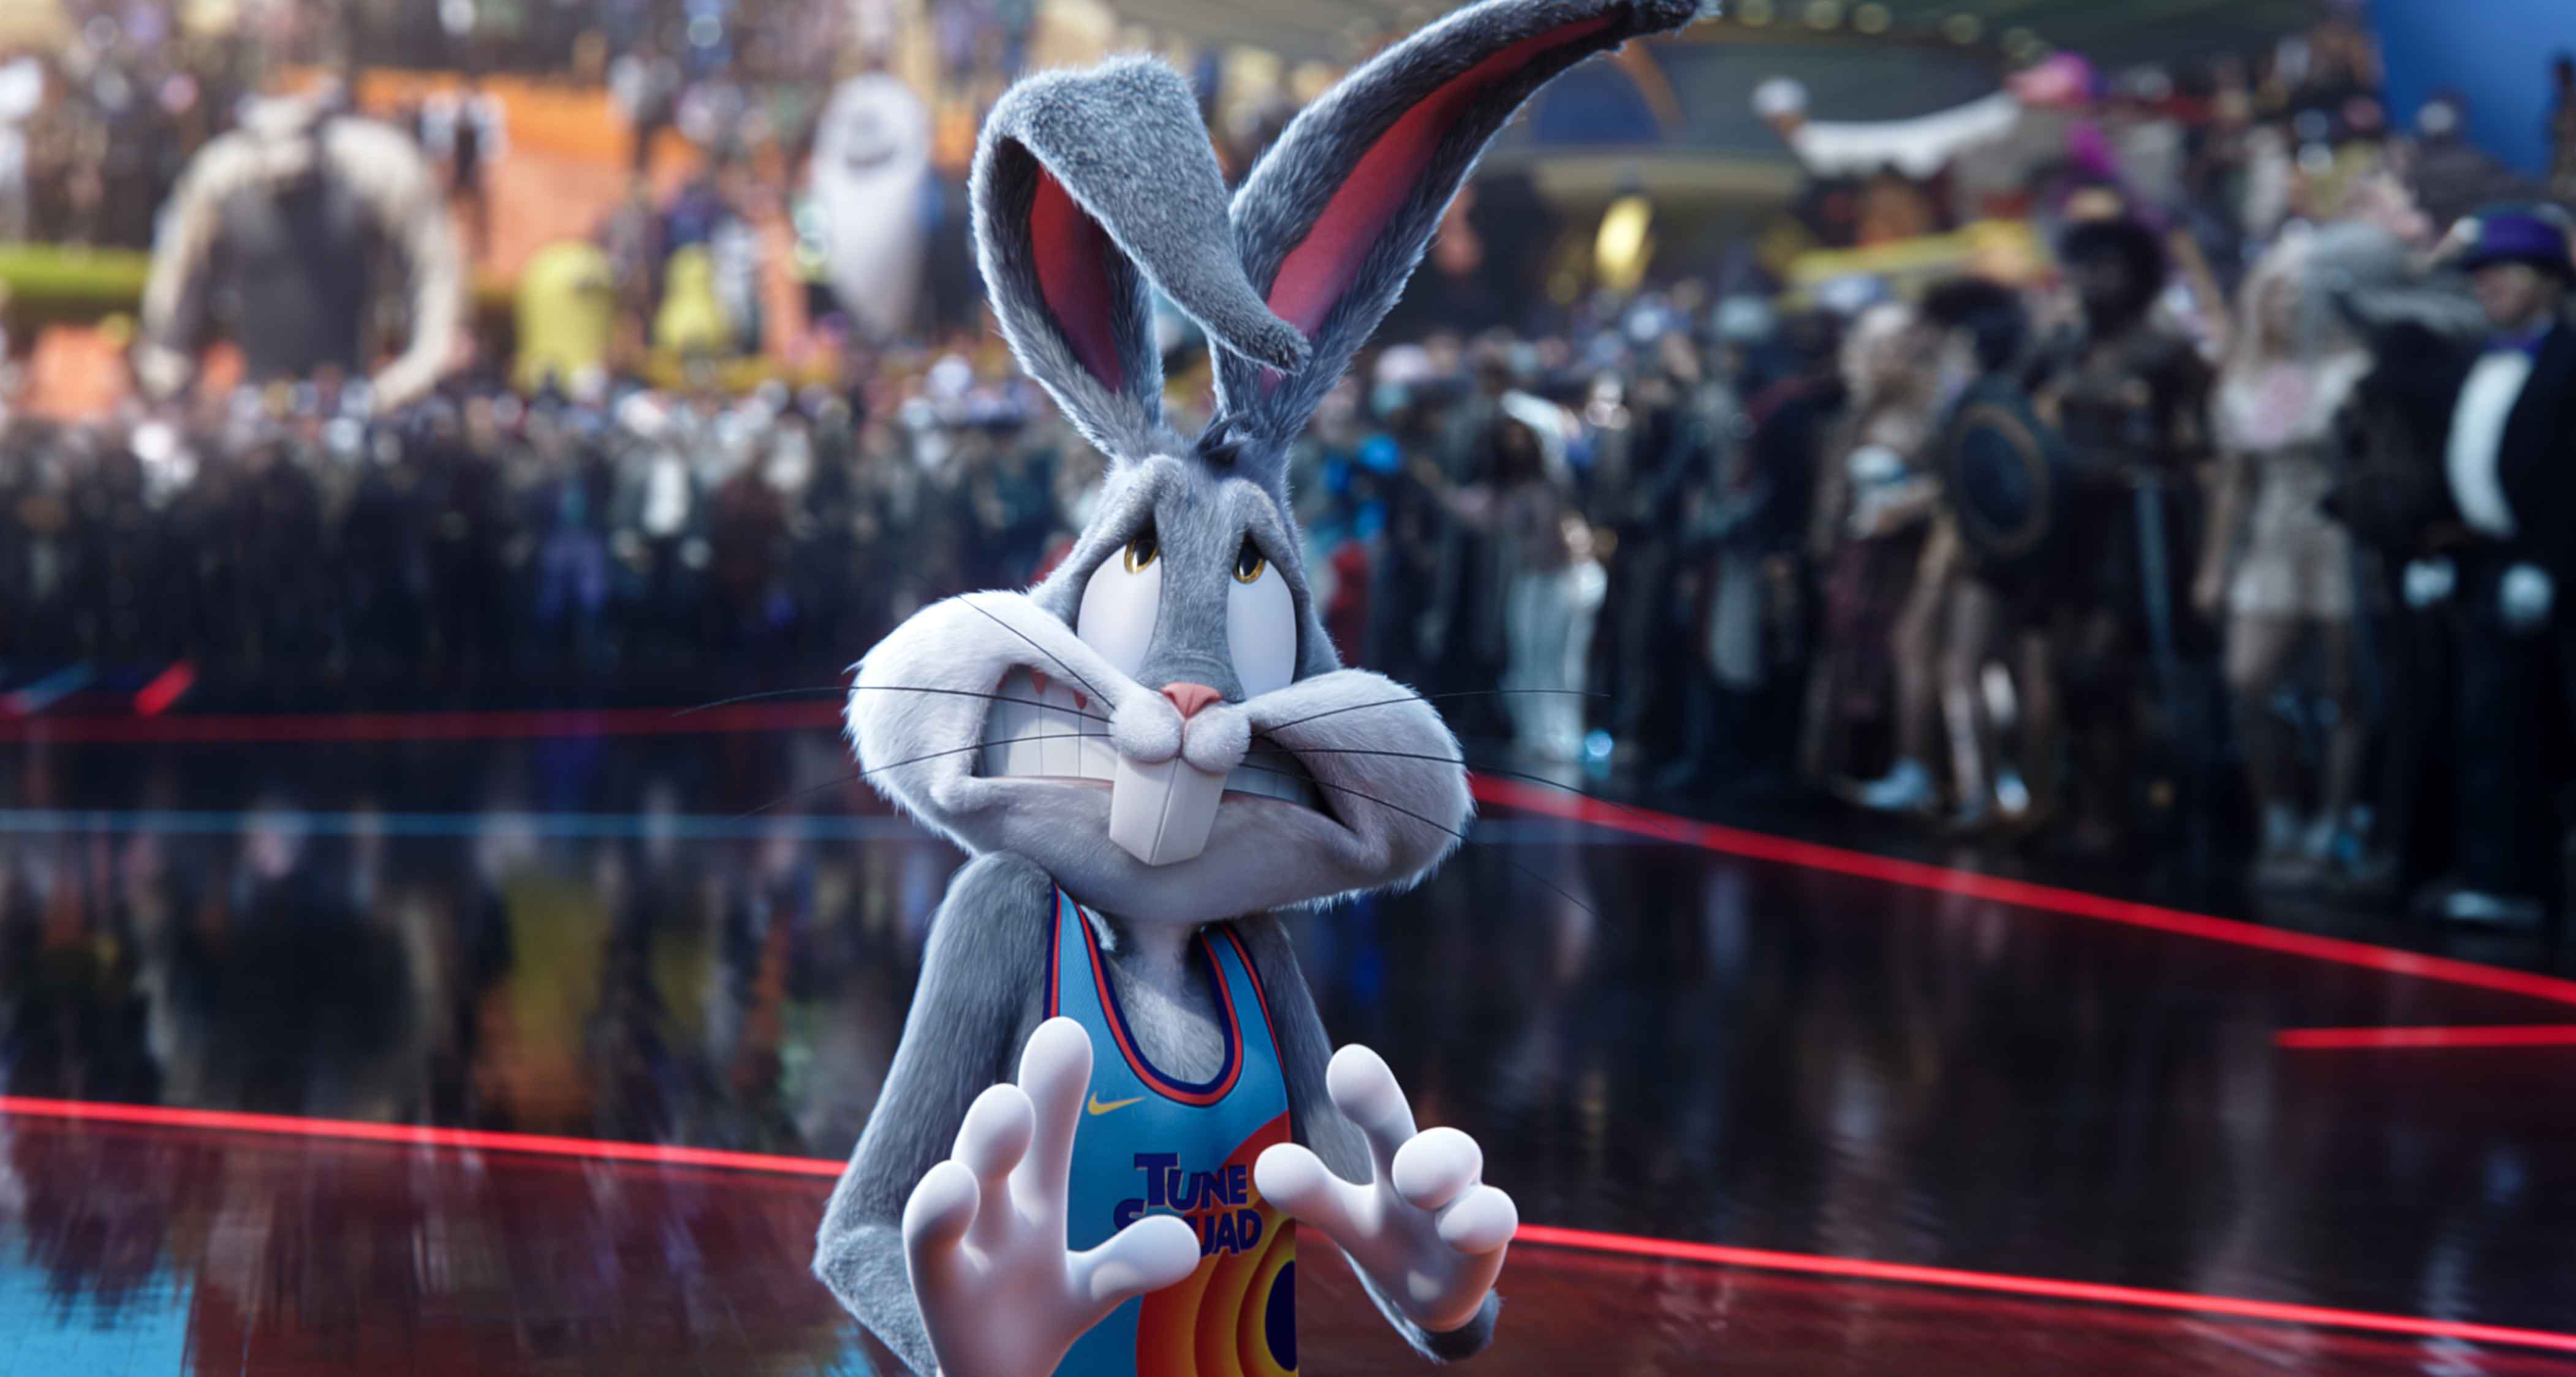 Bugs Bunny in Space Jam: New Legends